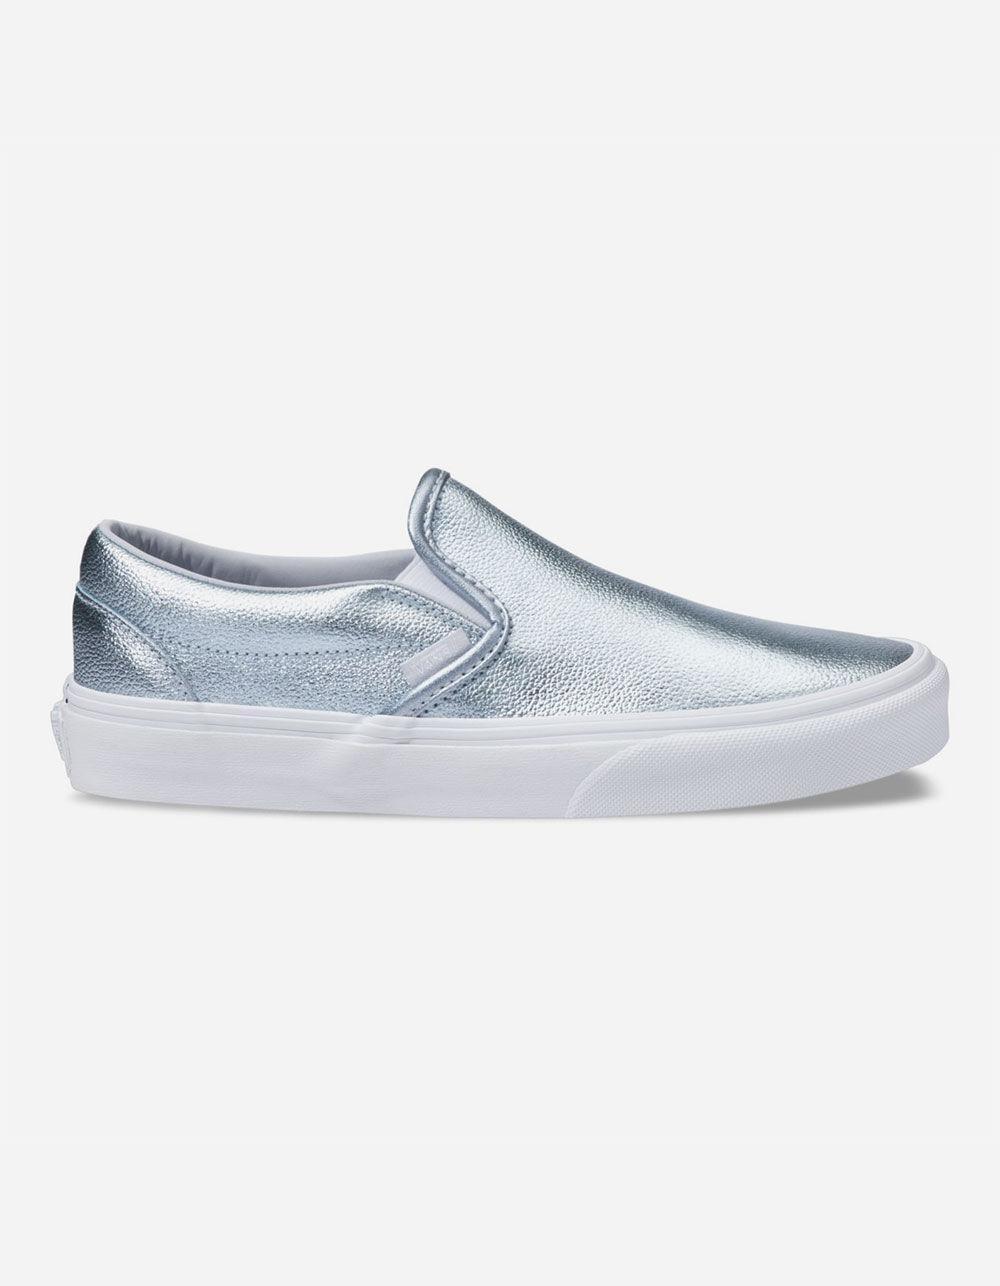 6ba93f9dceba79 Lyst - Vans Gray Dawn Womens Metallic Slip-on Shoes